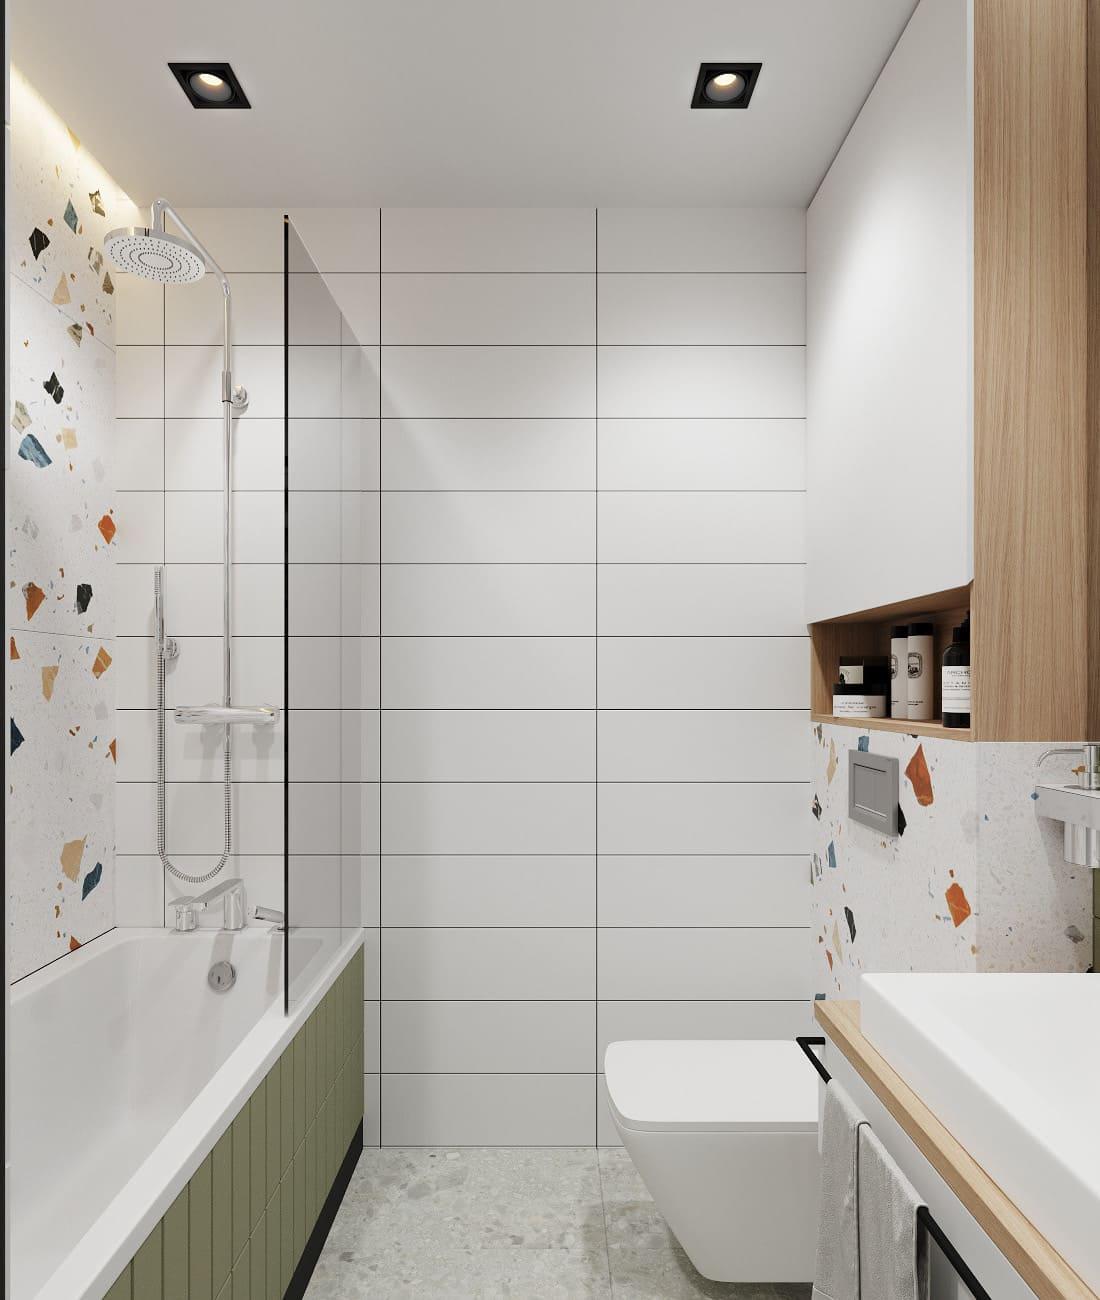 дизайн интерьера модной квартиры фото 95